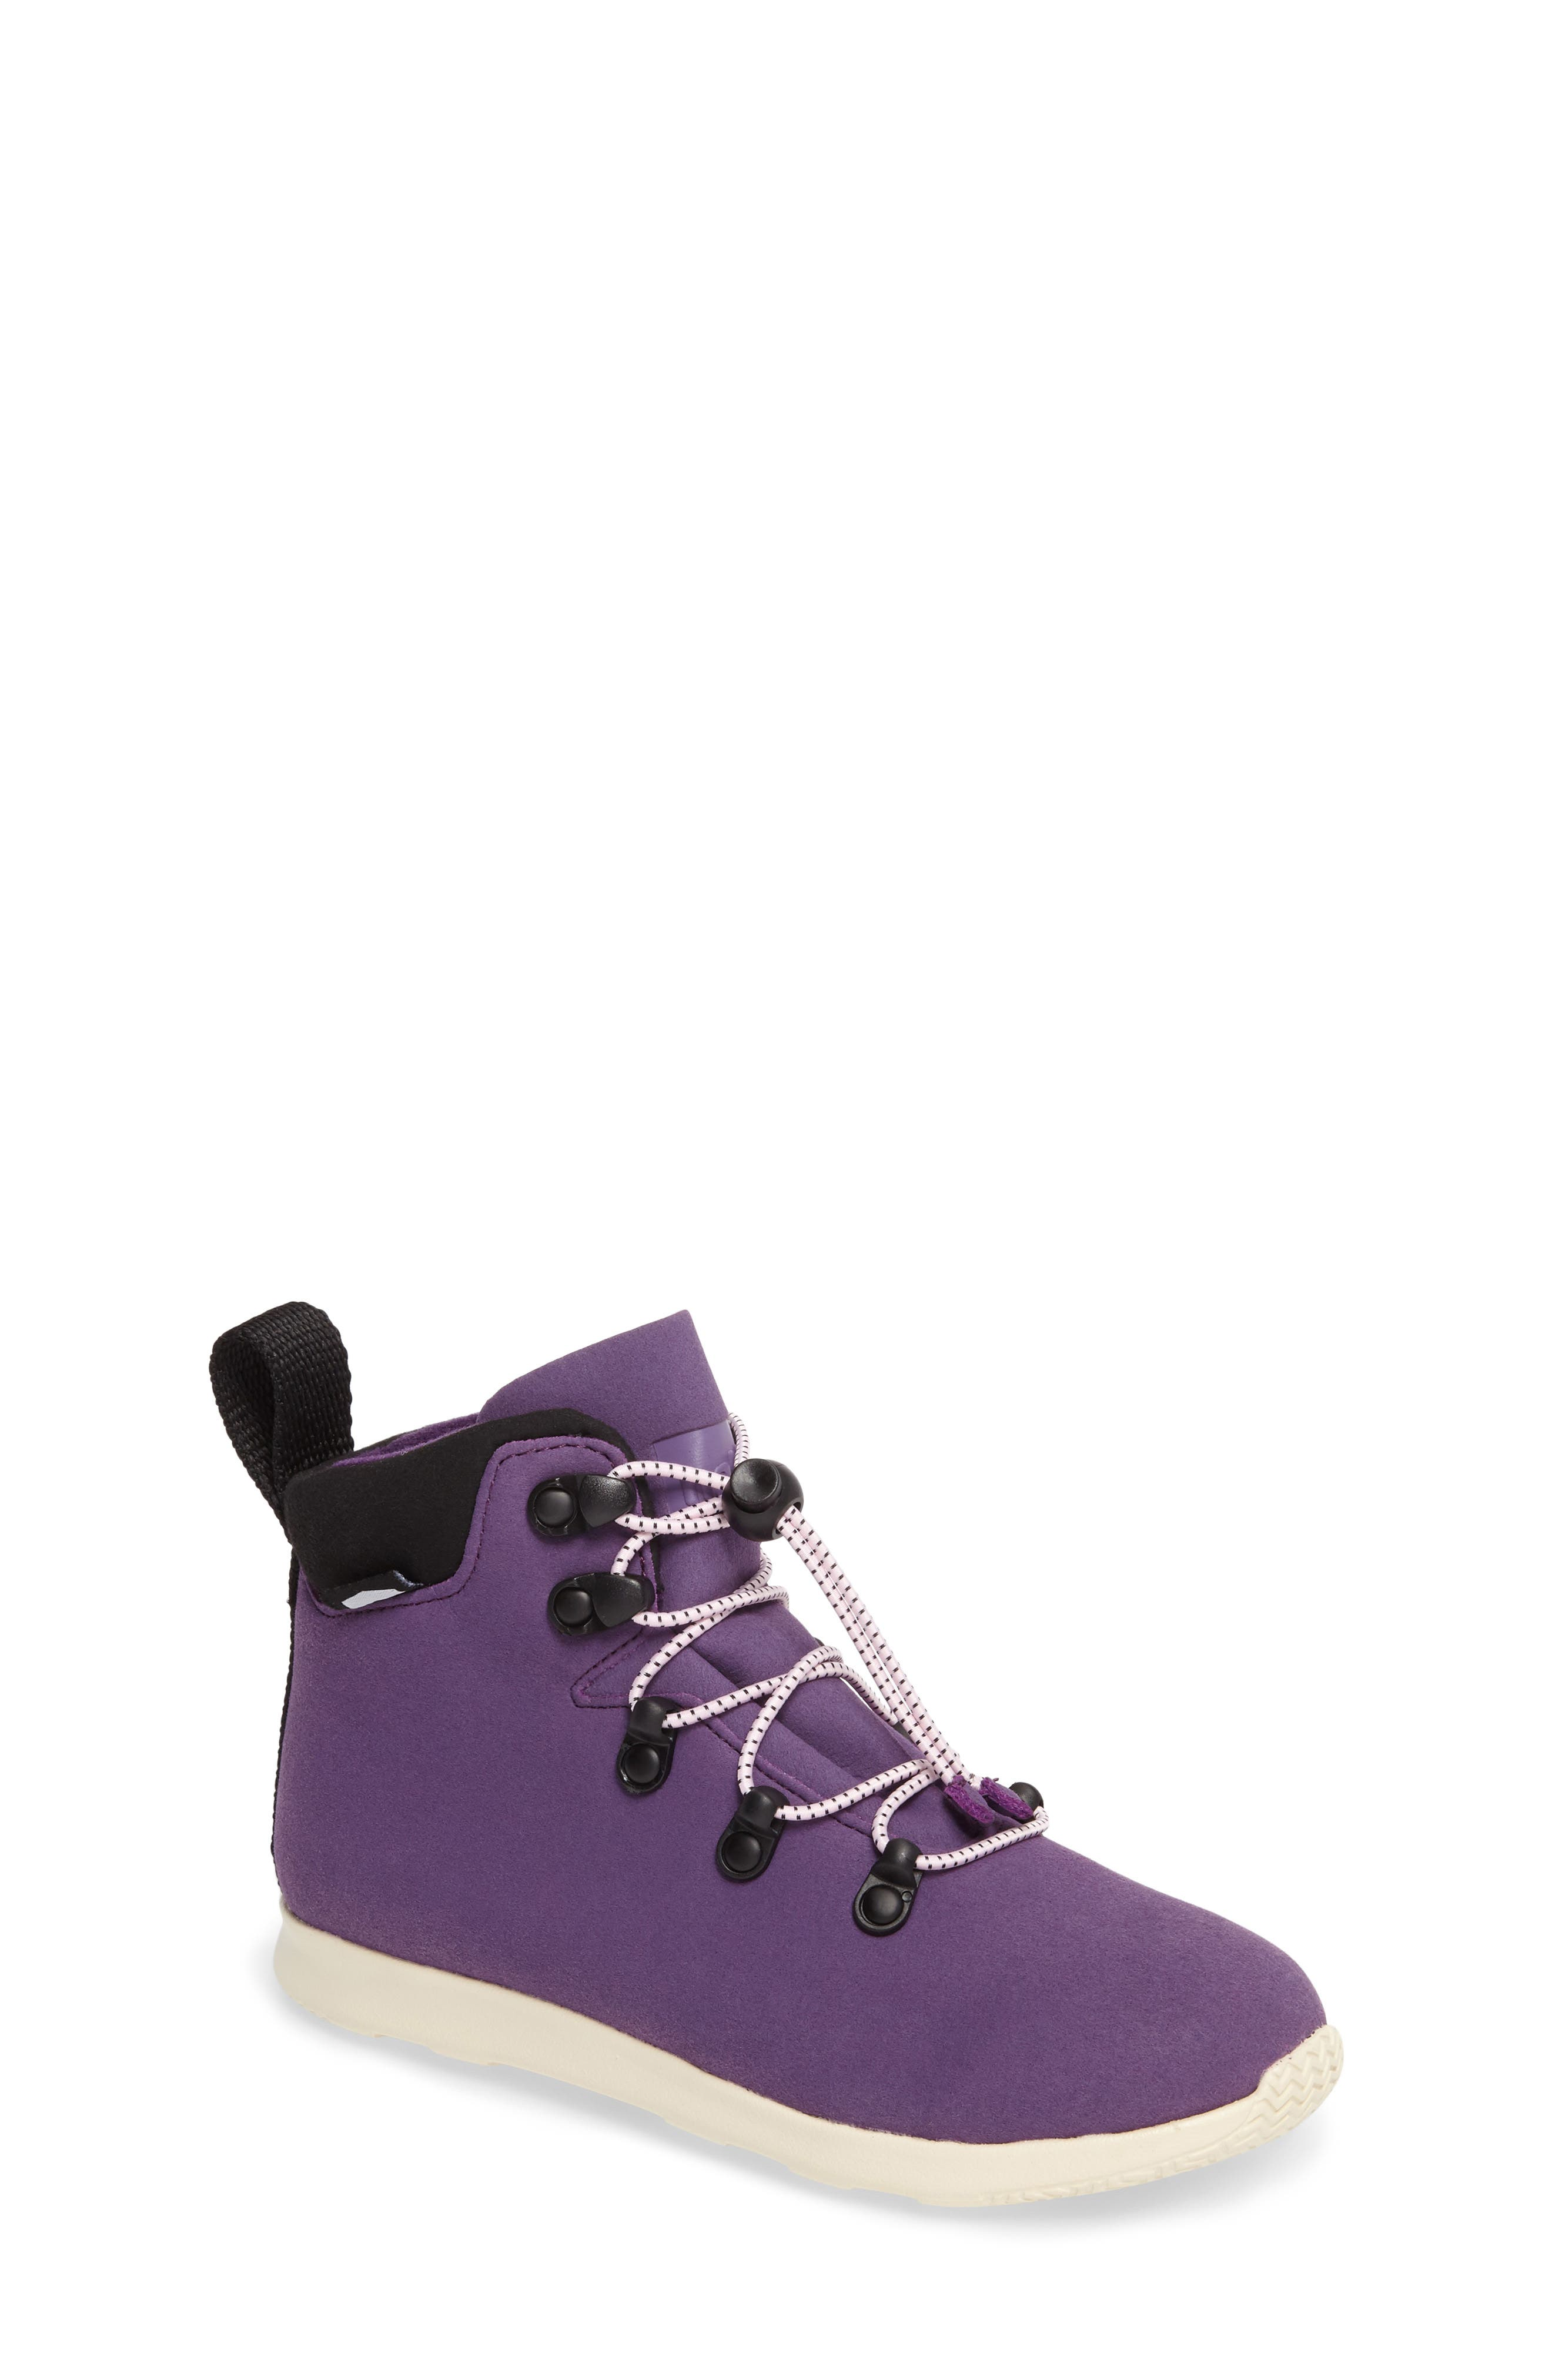 Native Shoes AP Apex Junior Sneaker Boot (Little Kid)